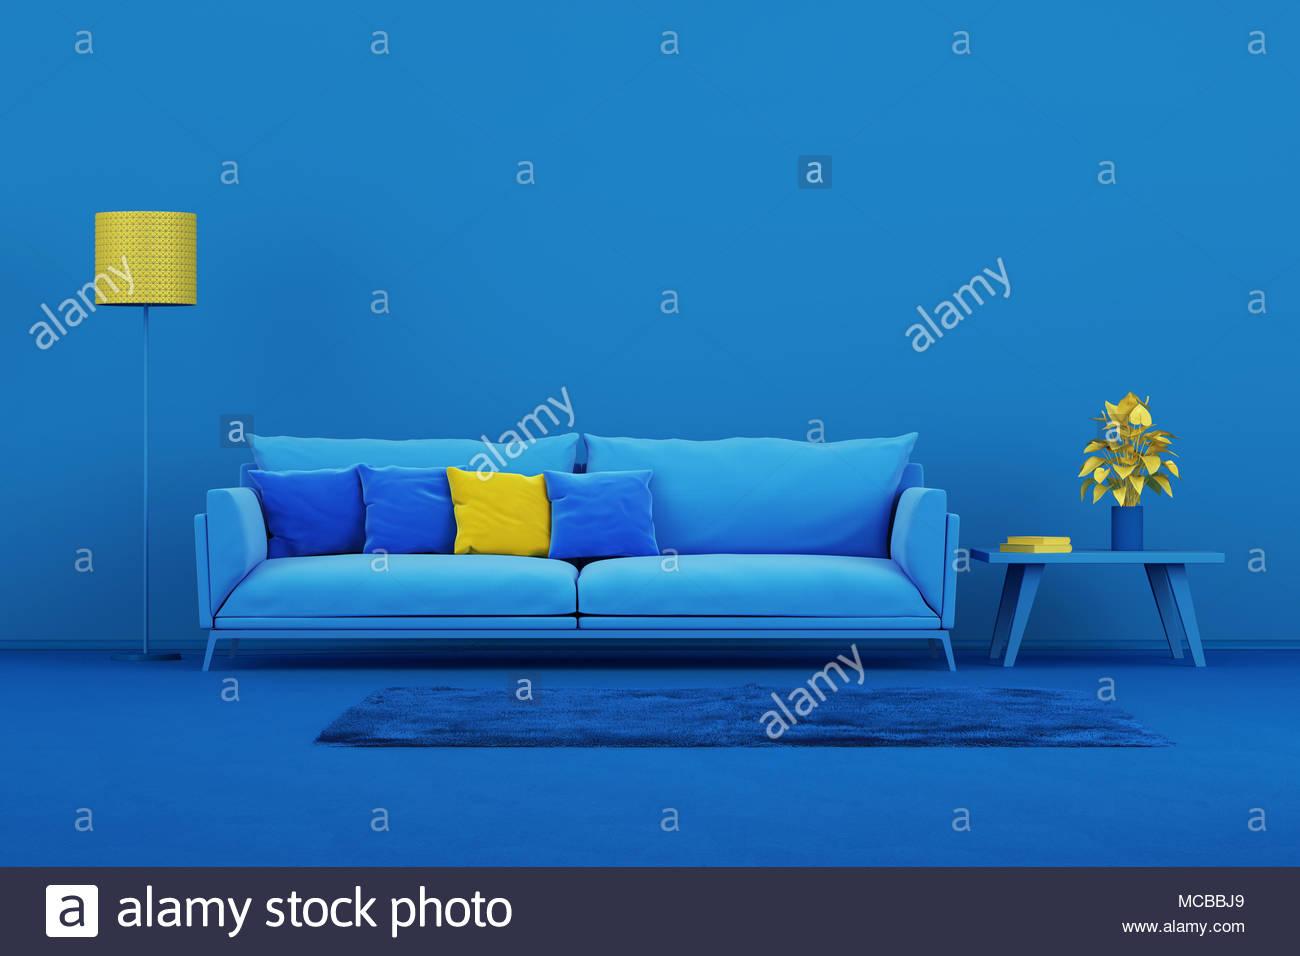 Interior Design Minimal Style Konzept Blue Modernes Sofa Blau